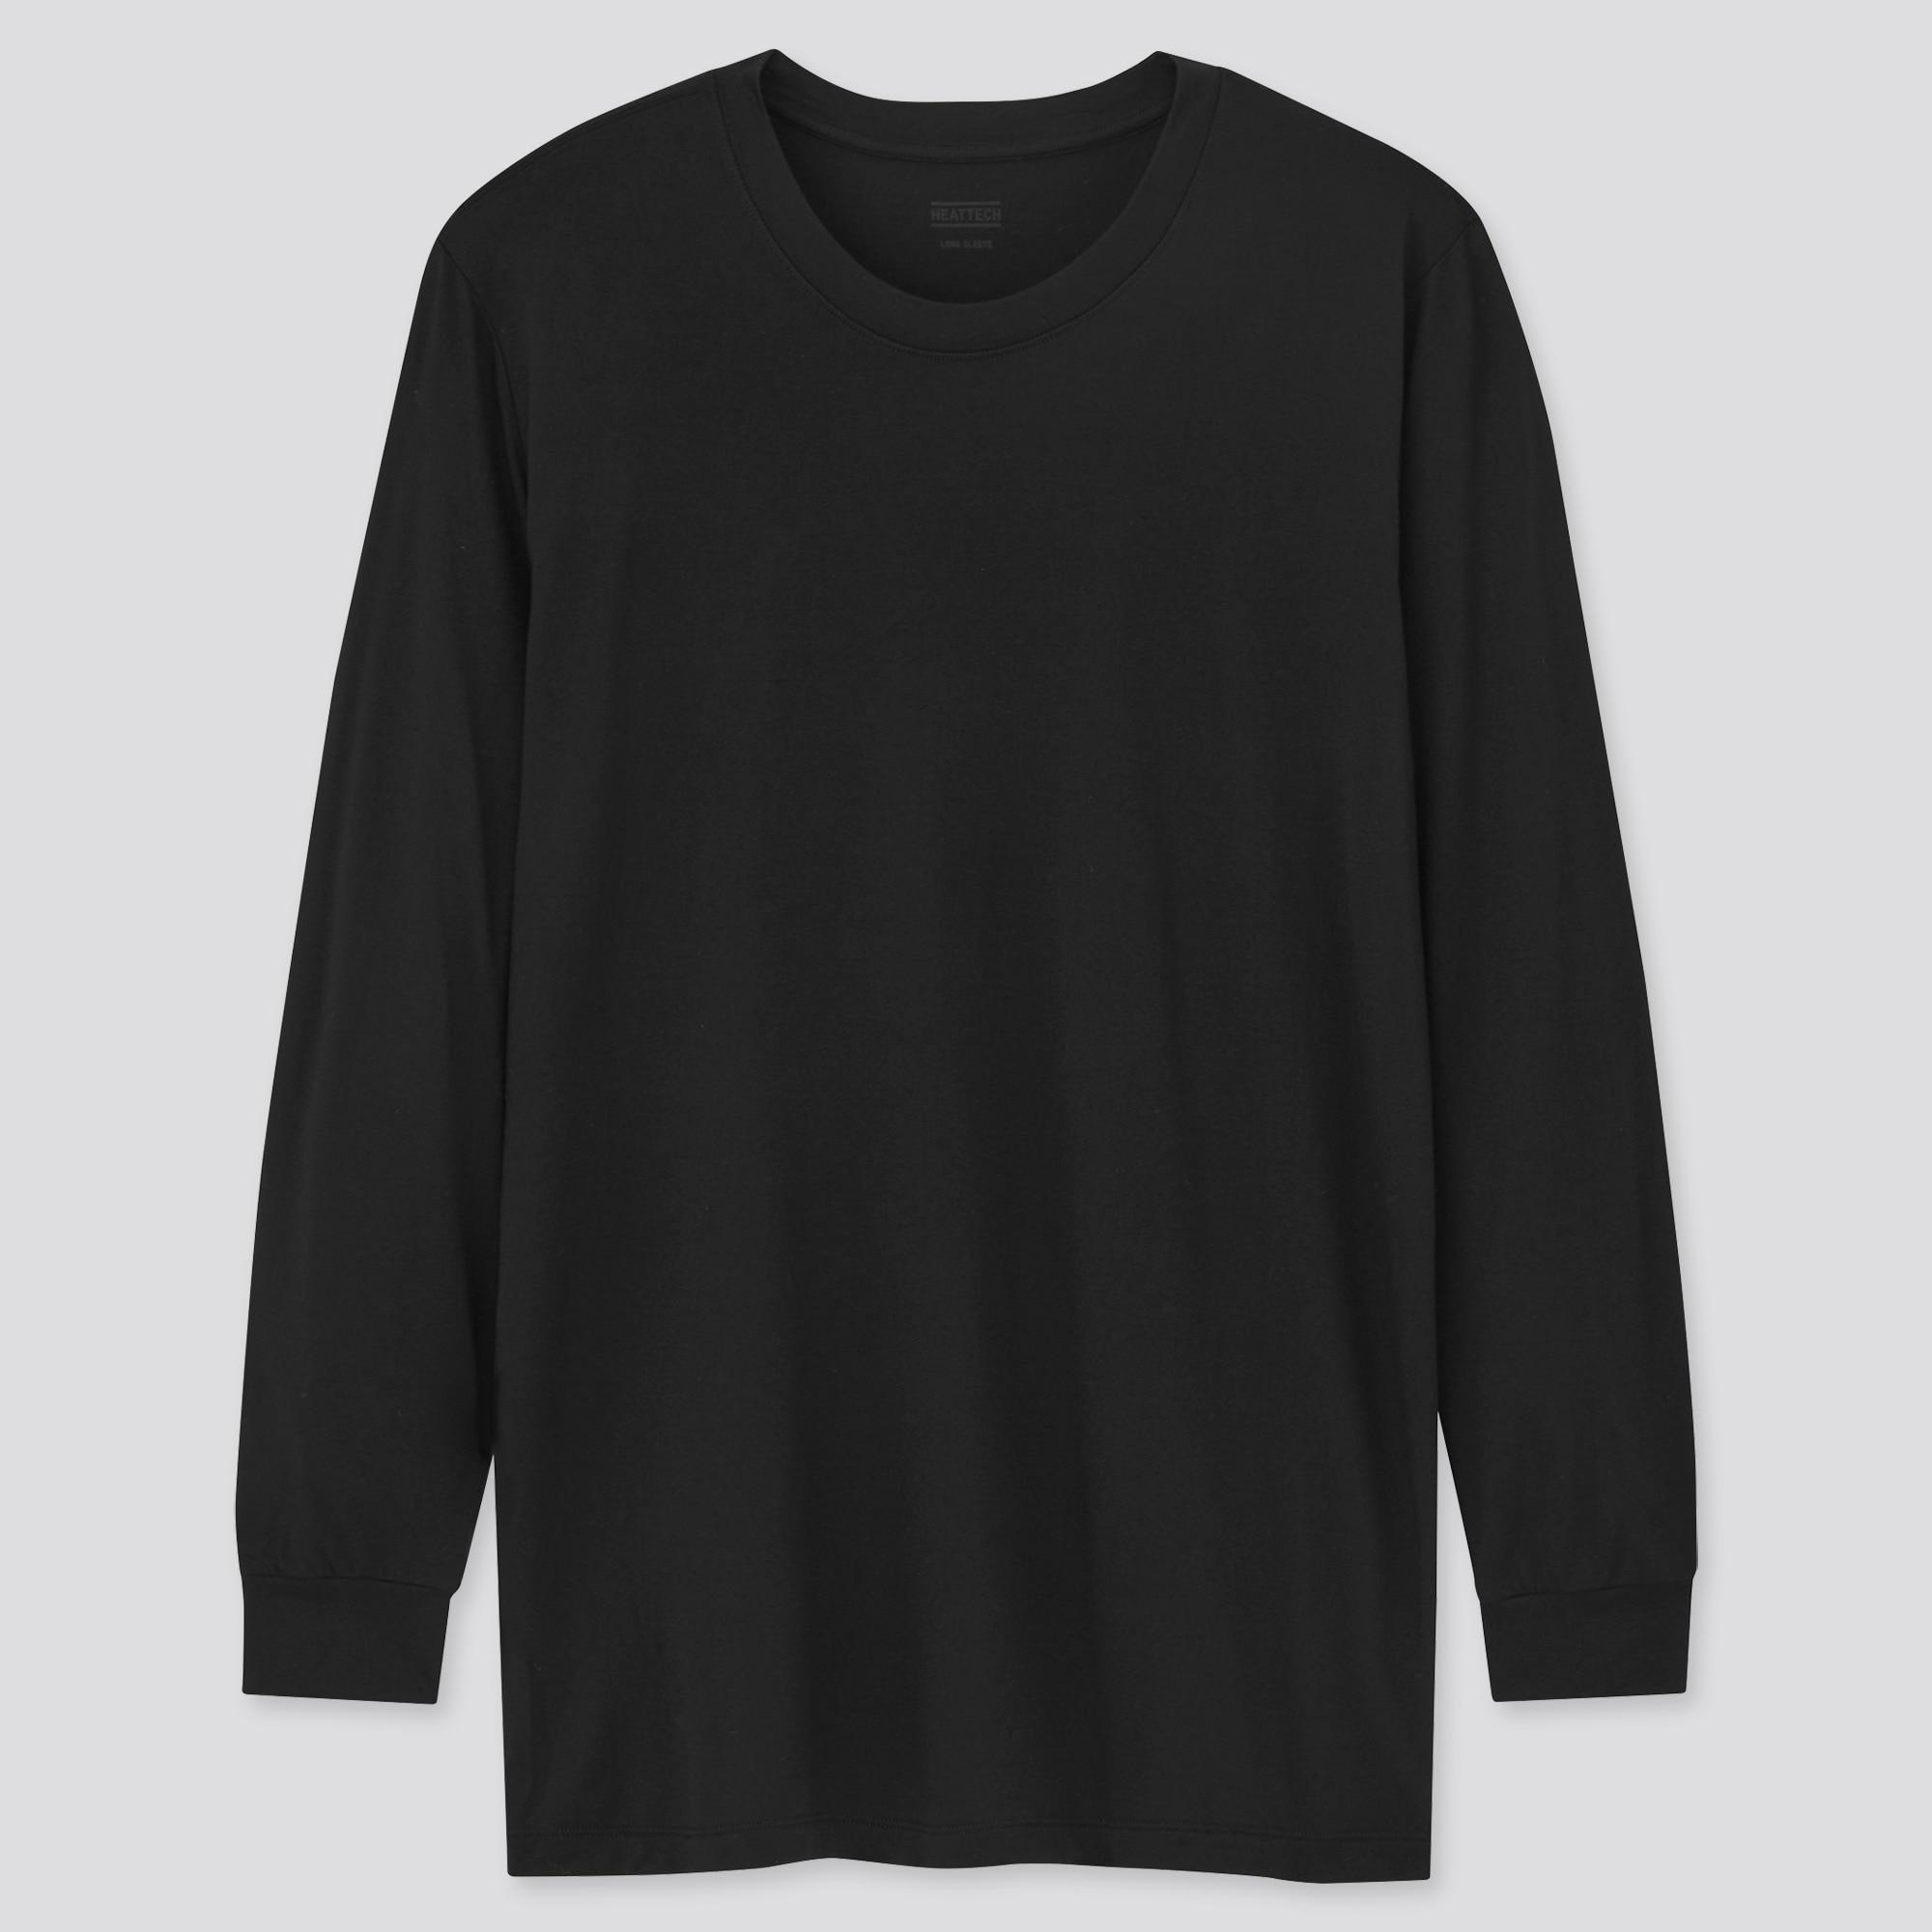 Uniqlo Men's Heattach crew neck long-sleeve shirt